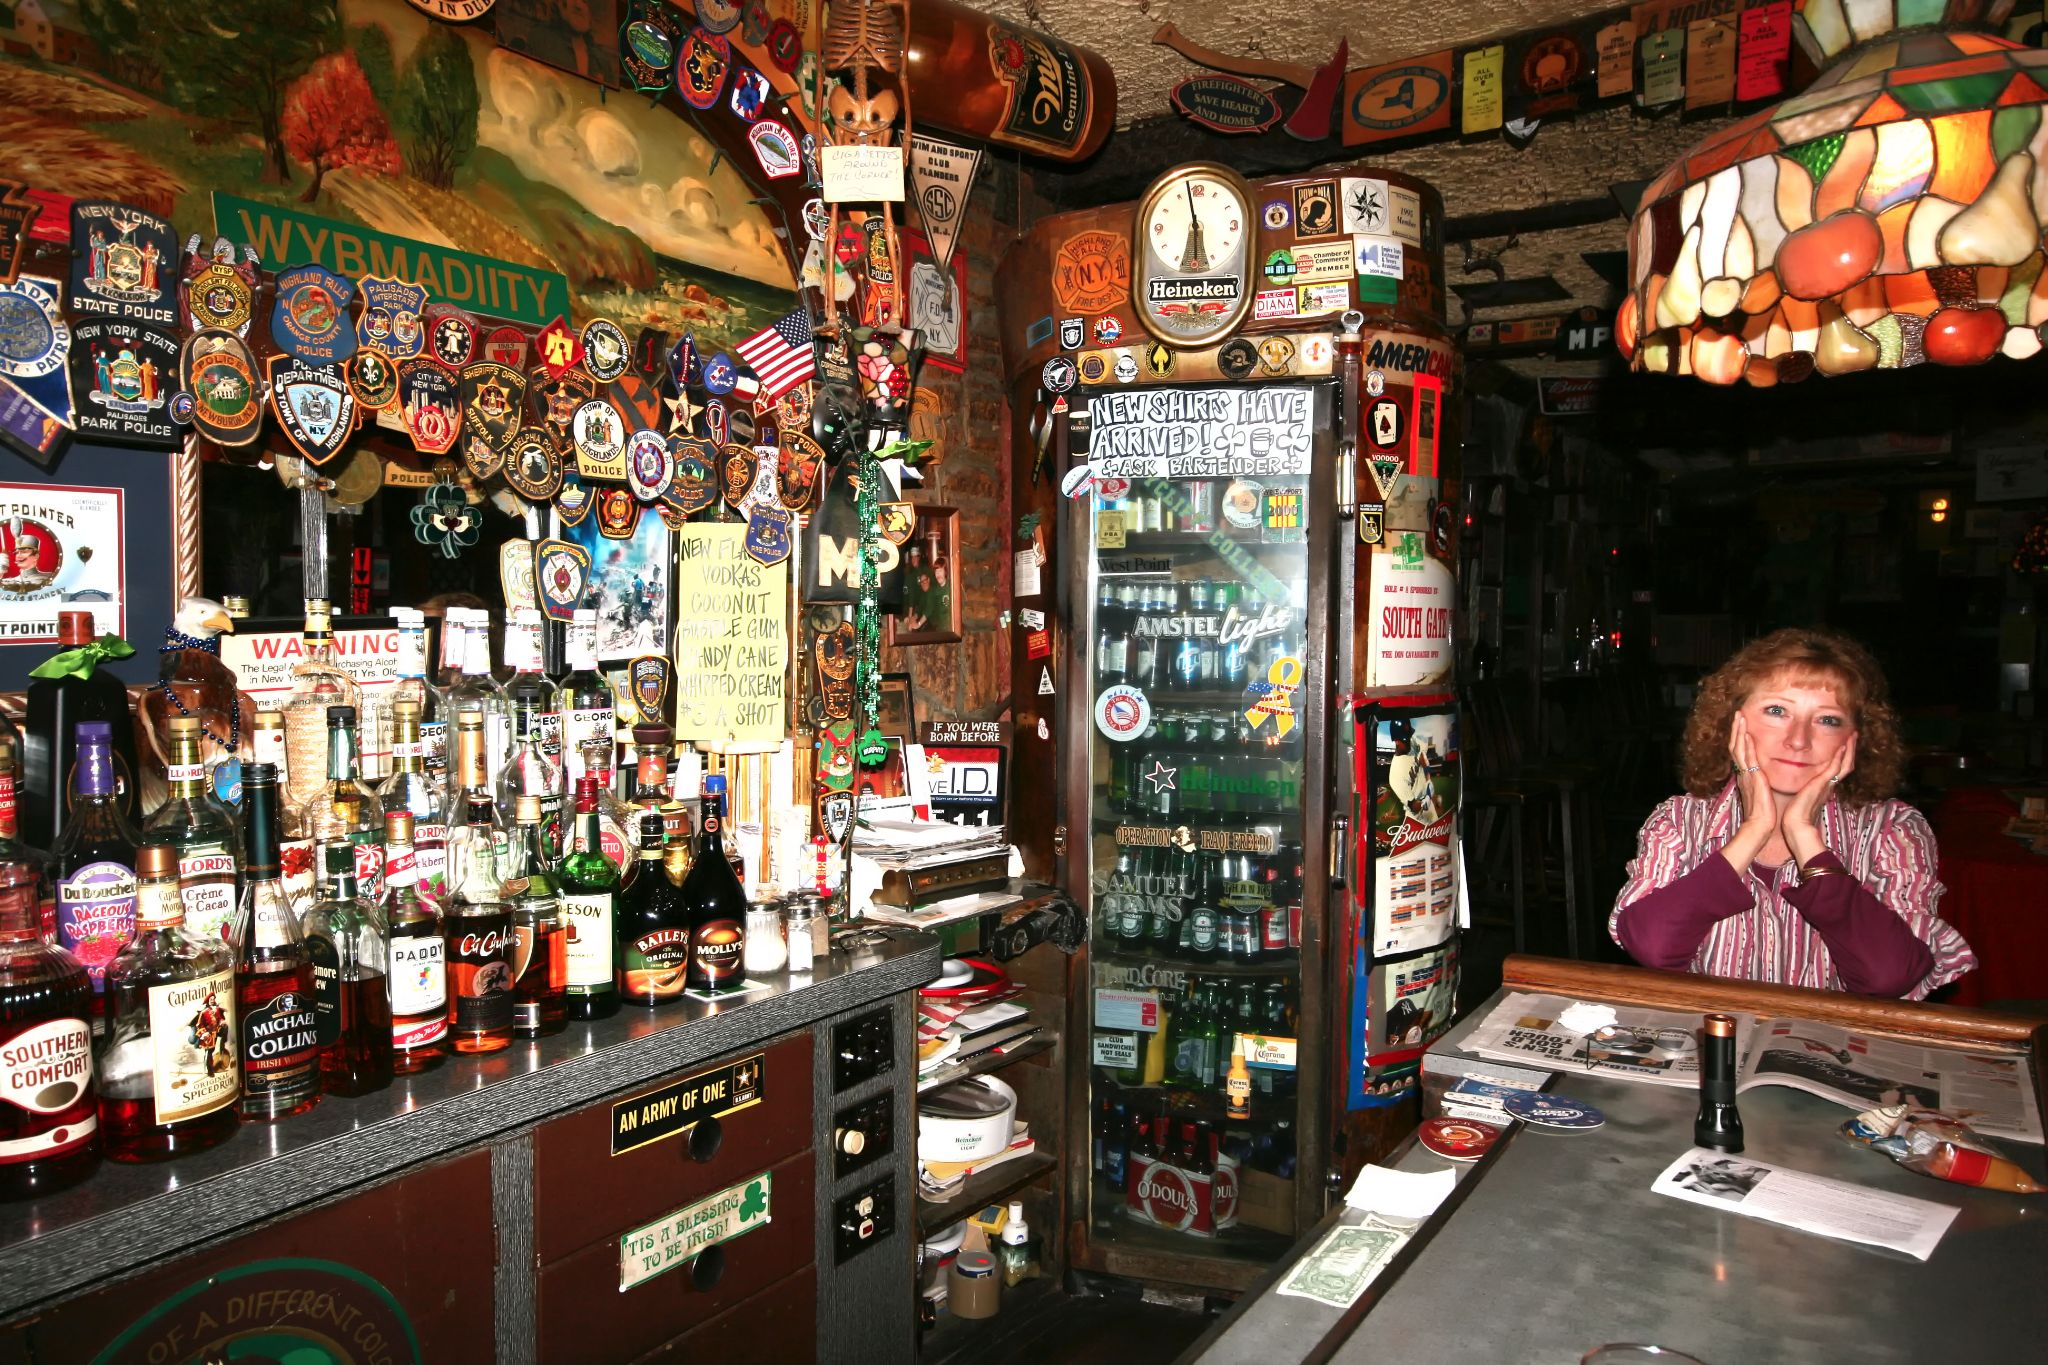 South gate tavern - west  point  by massimo.rivaroli